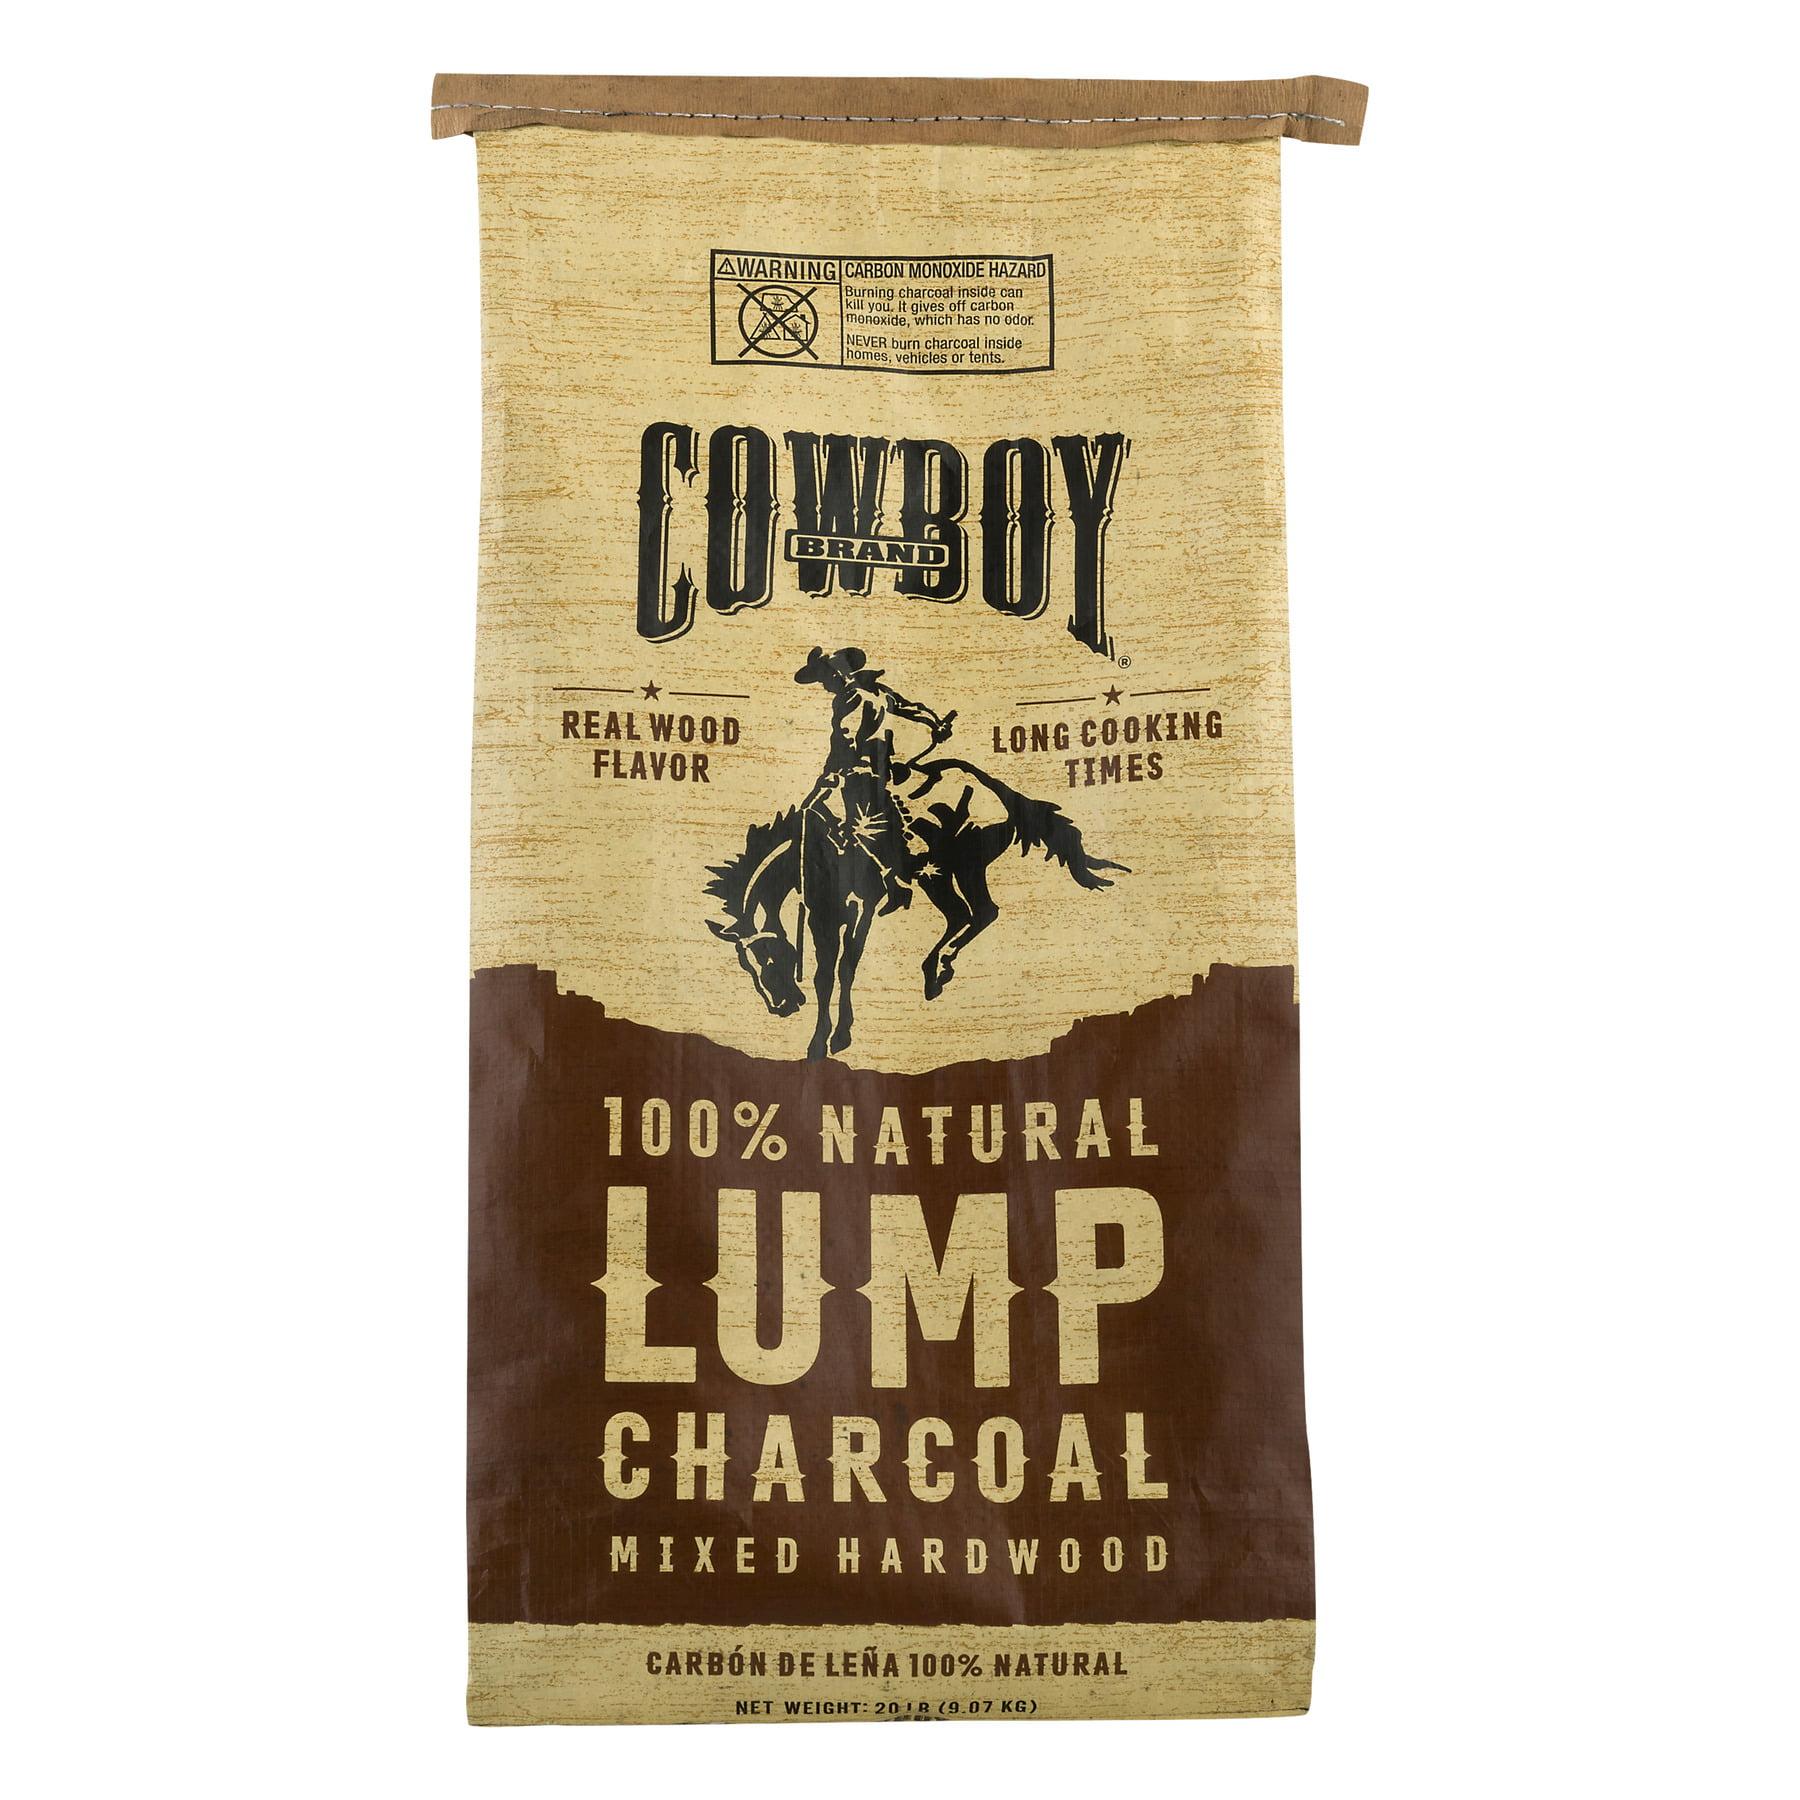 Cowboy 20lb All Natural Long Lasting Hardwood Lump